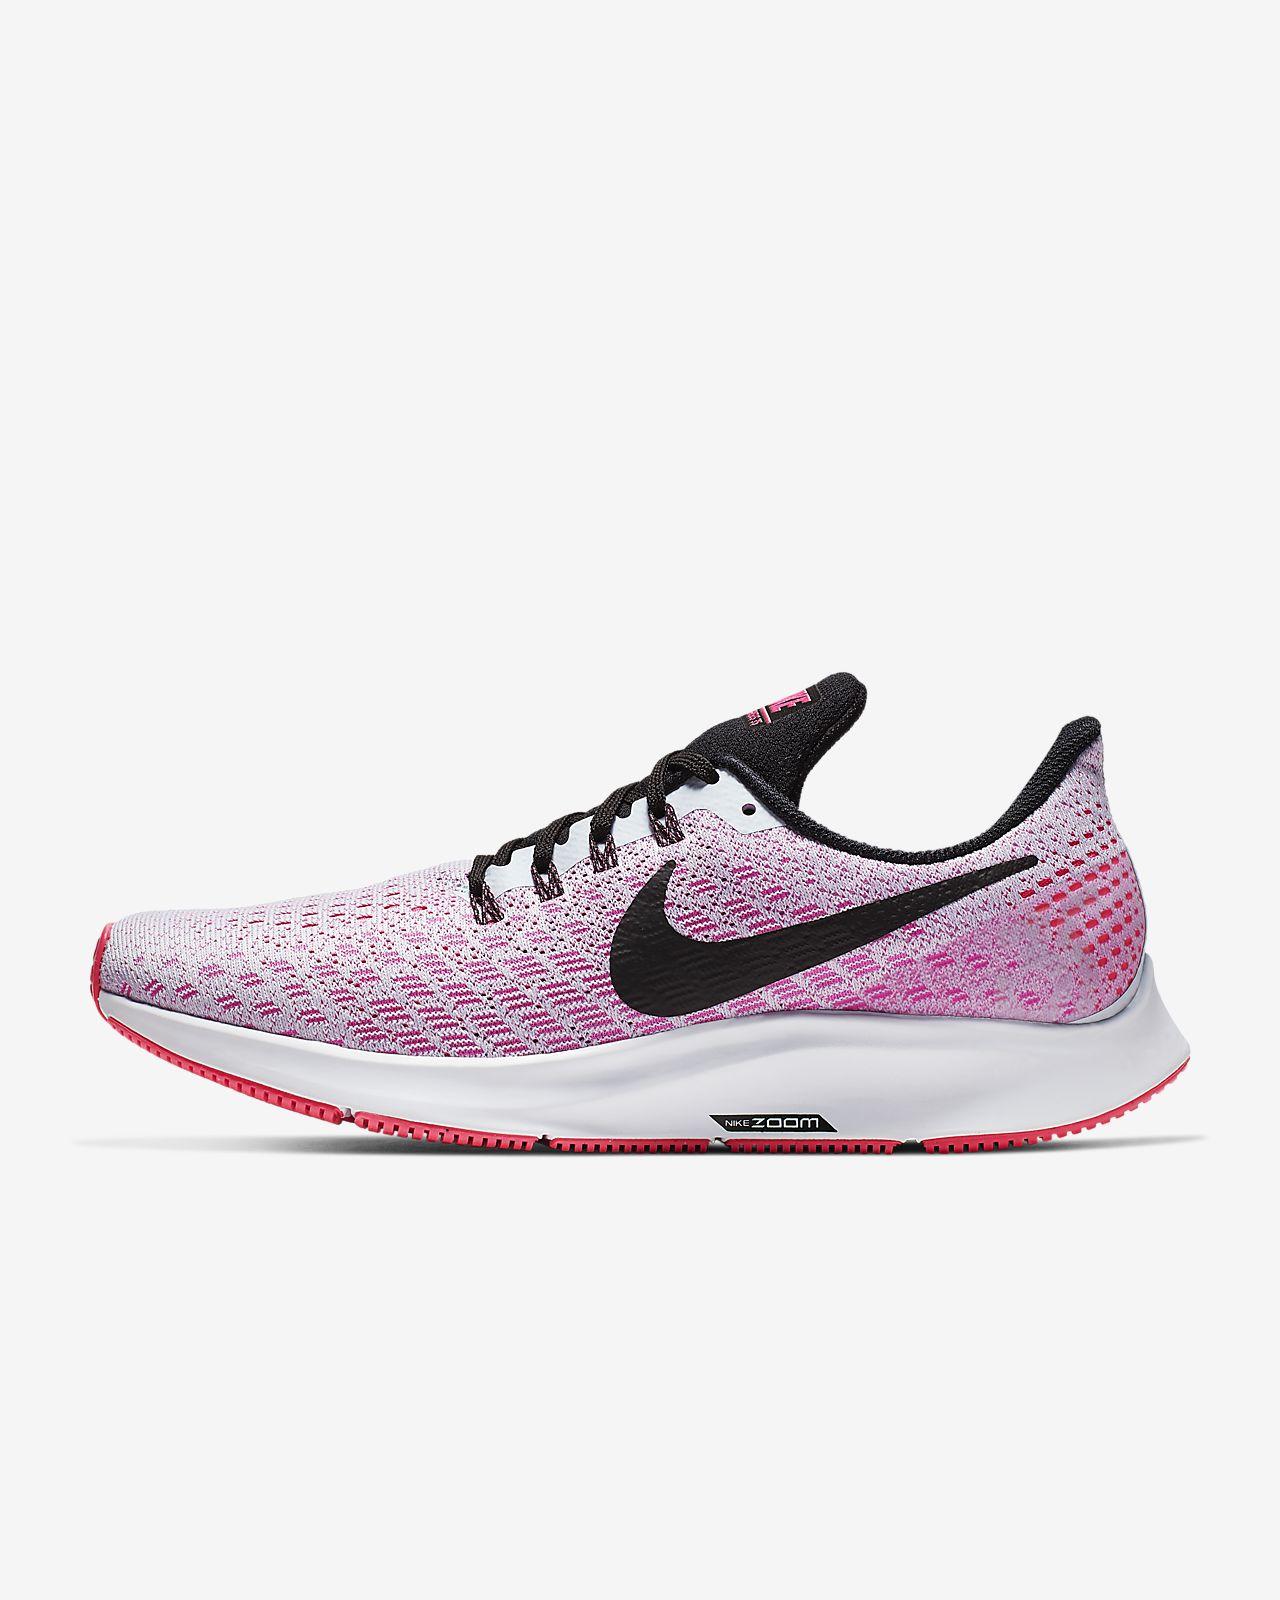 c263dbe645a1fa Nike Air Zoom Pegasus 35 Damen-Laufschuh. Nike.com DE